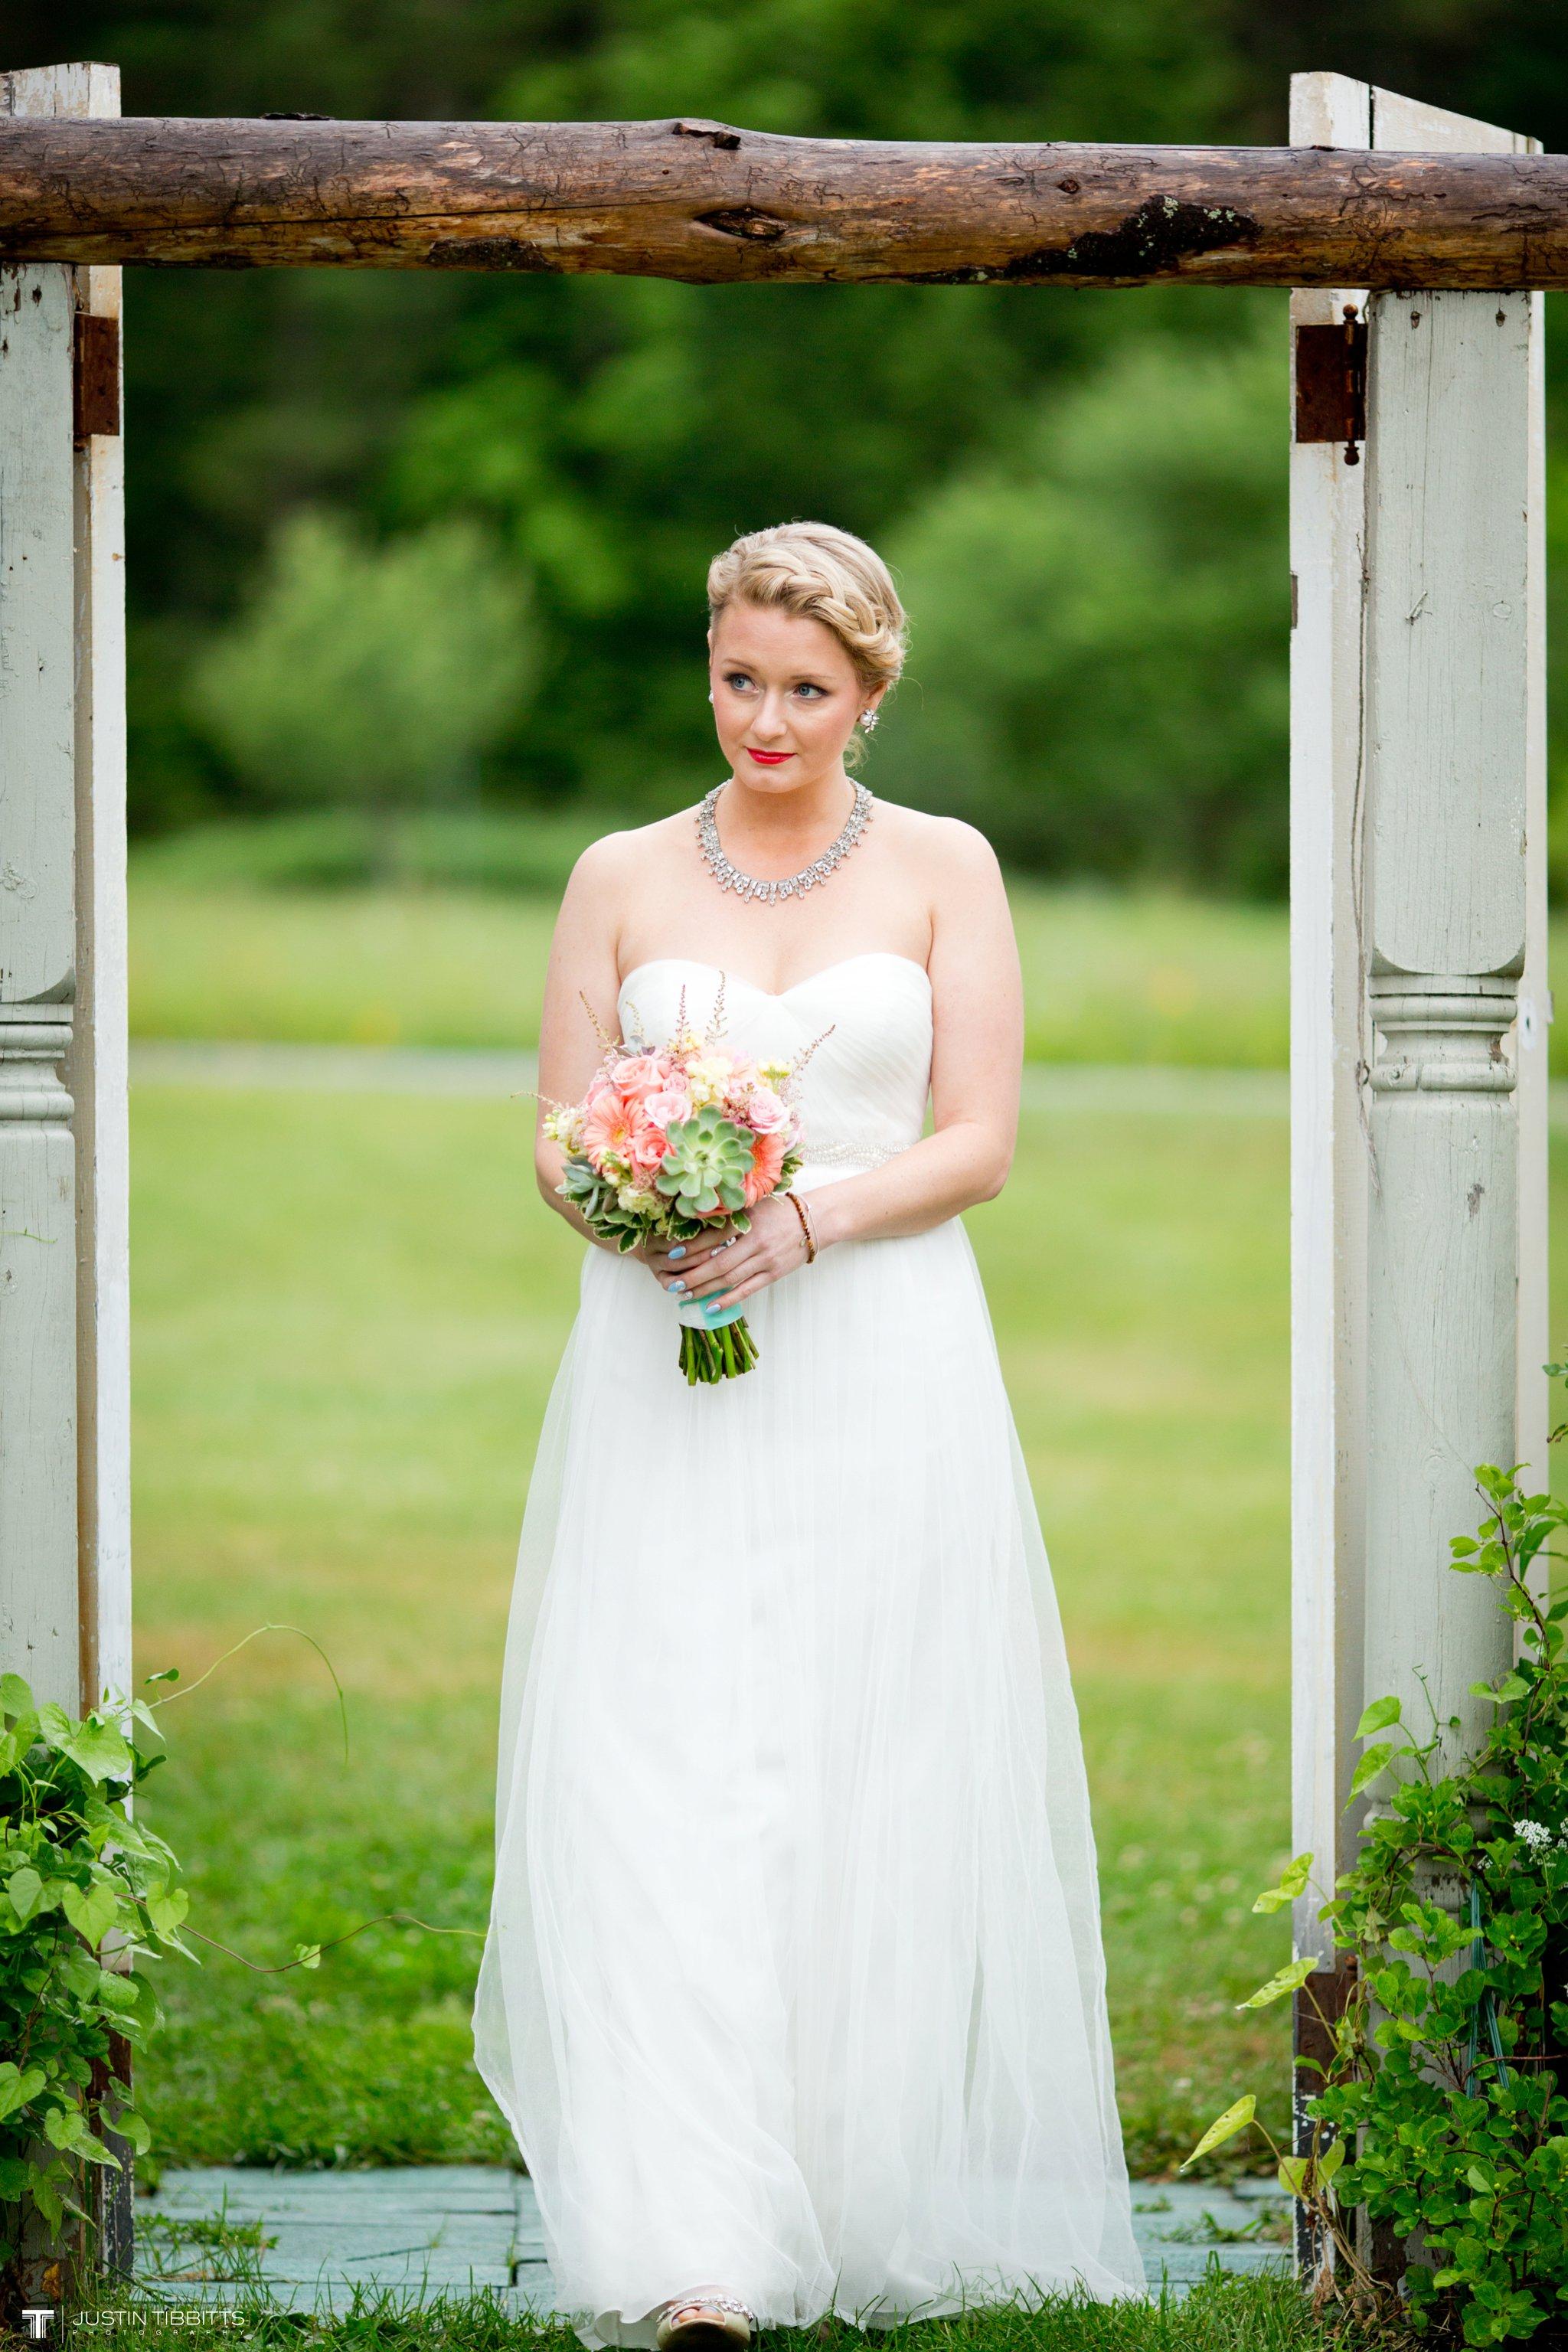 burlap-and-beams-wedding-photos-with-joran-and-molly_0053